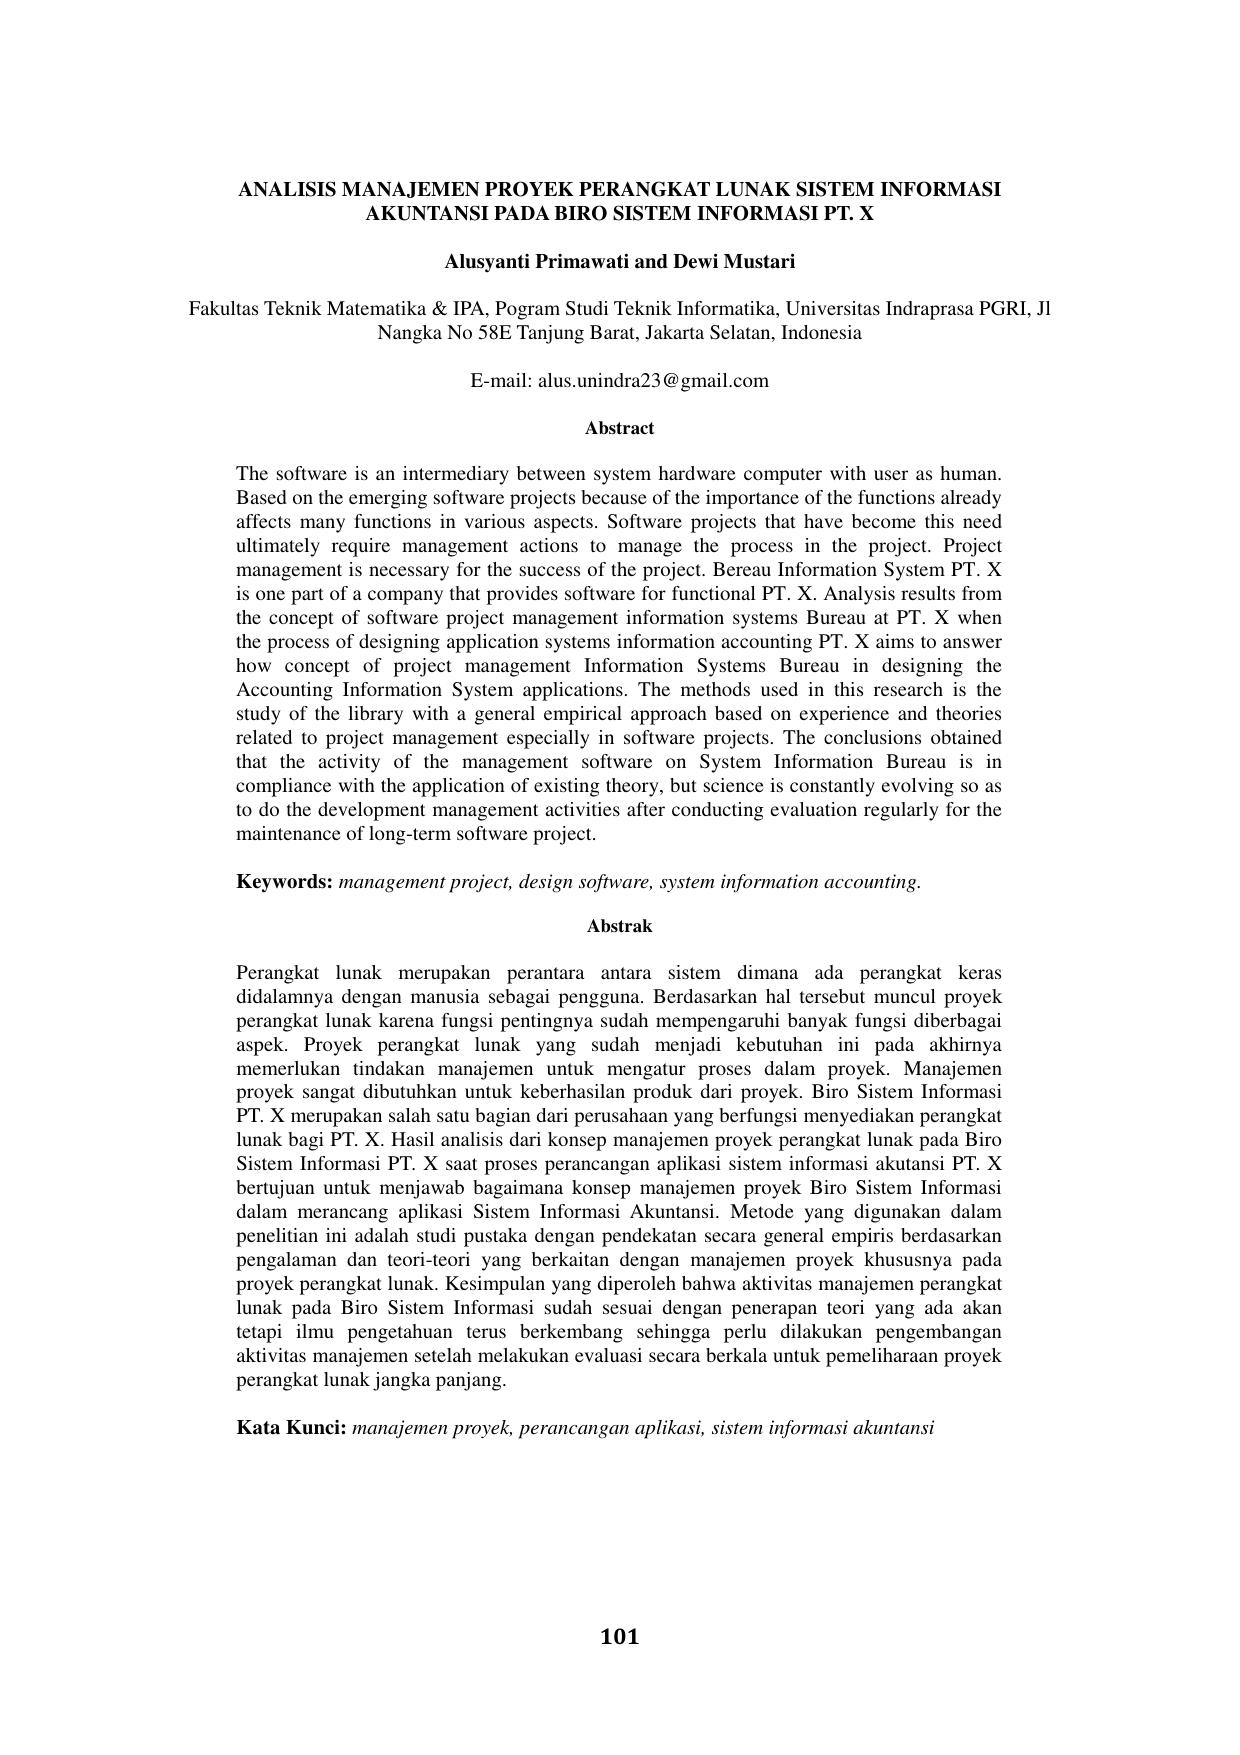 Analisis Manajemen Proyek Perangkat Lunak